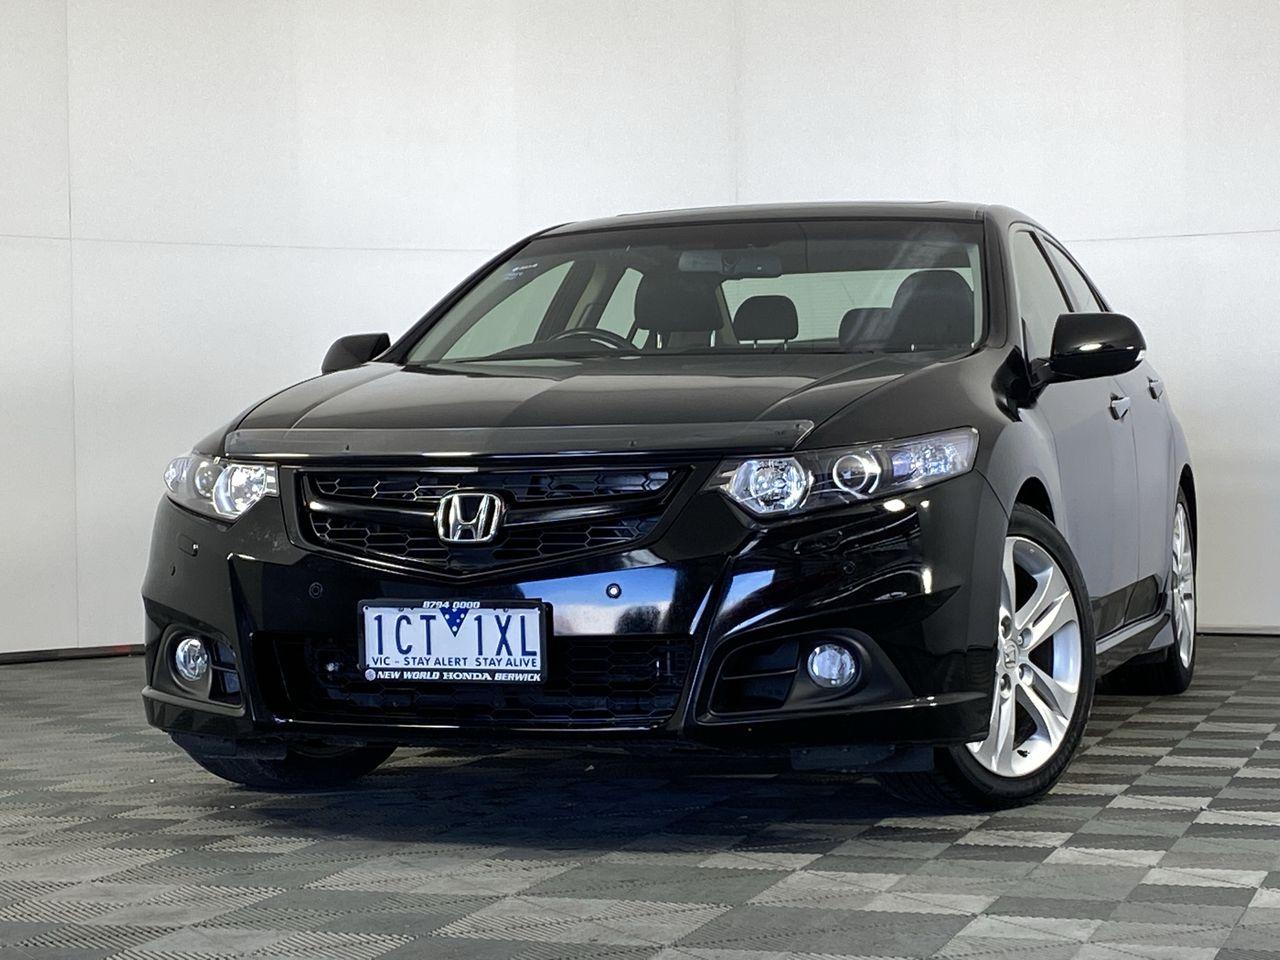 2014 Honda Accord Euro Luxury 8TH GEN Automatic Sedan